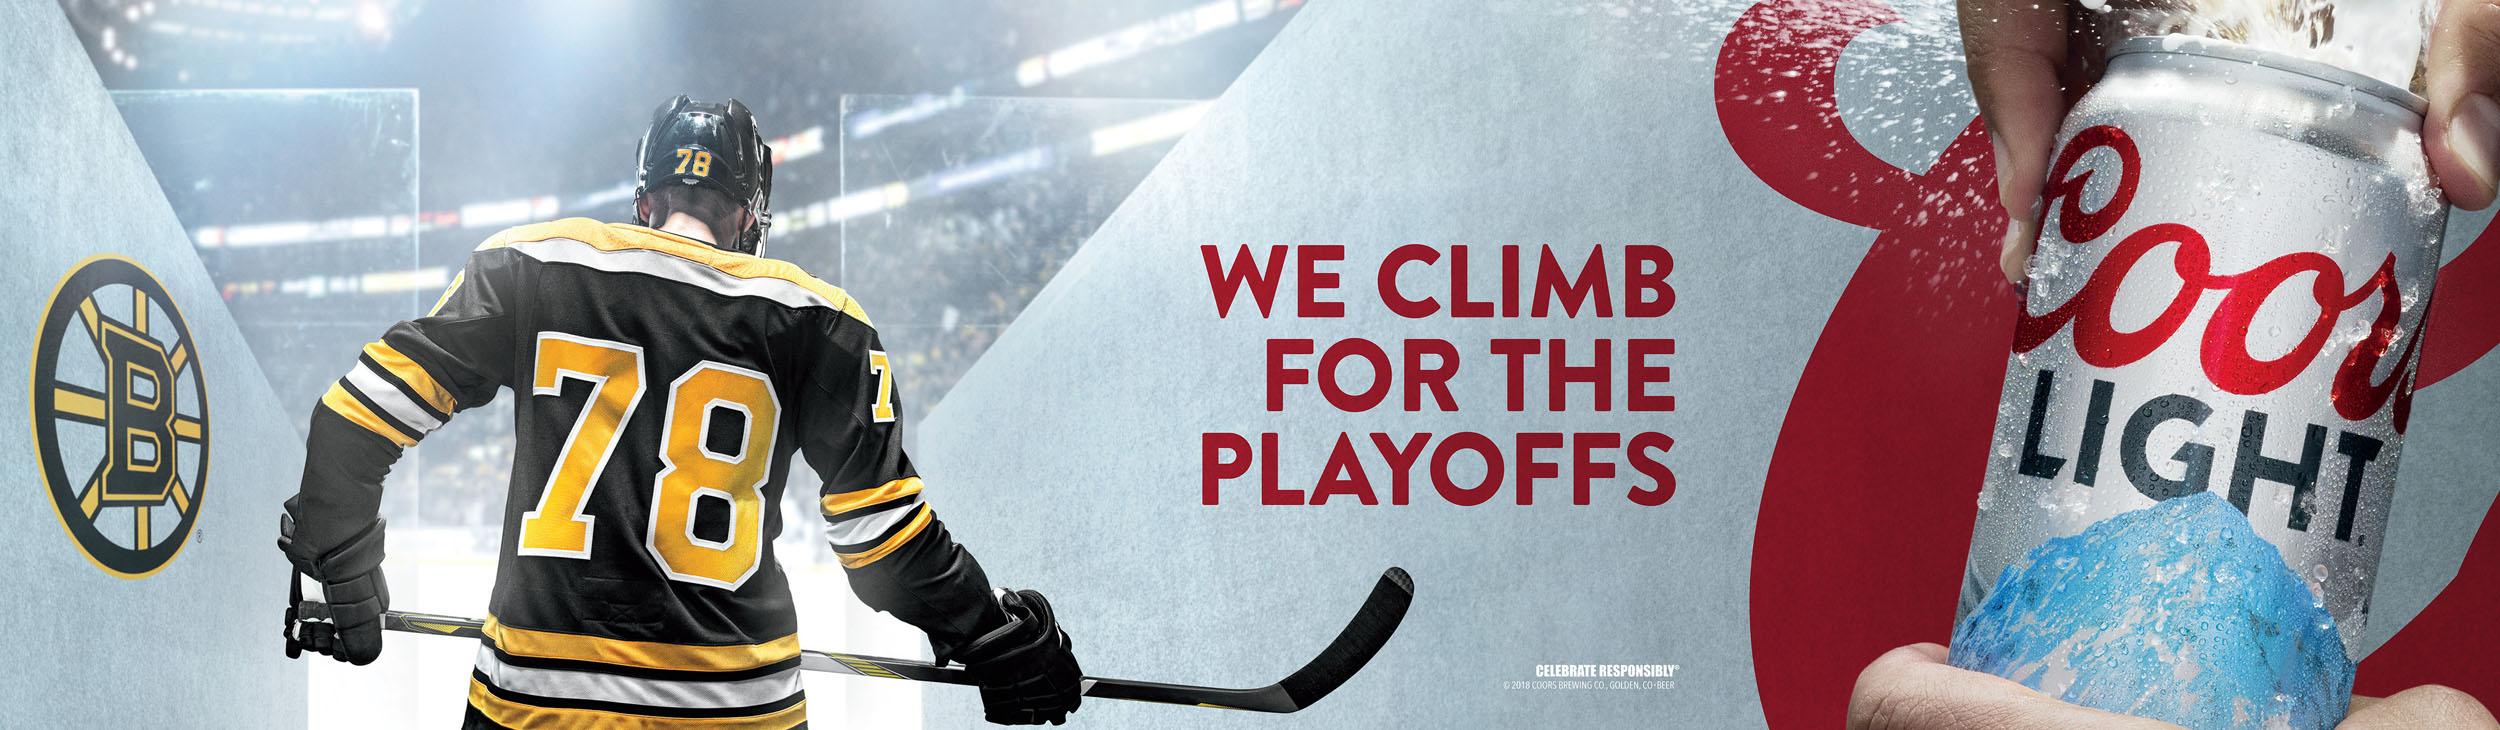 4318_C2_MC_CL_2018SPORTS_Boston_Bruins_14x48_r8_.jpg